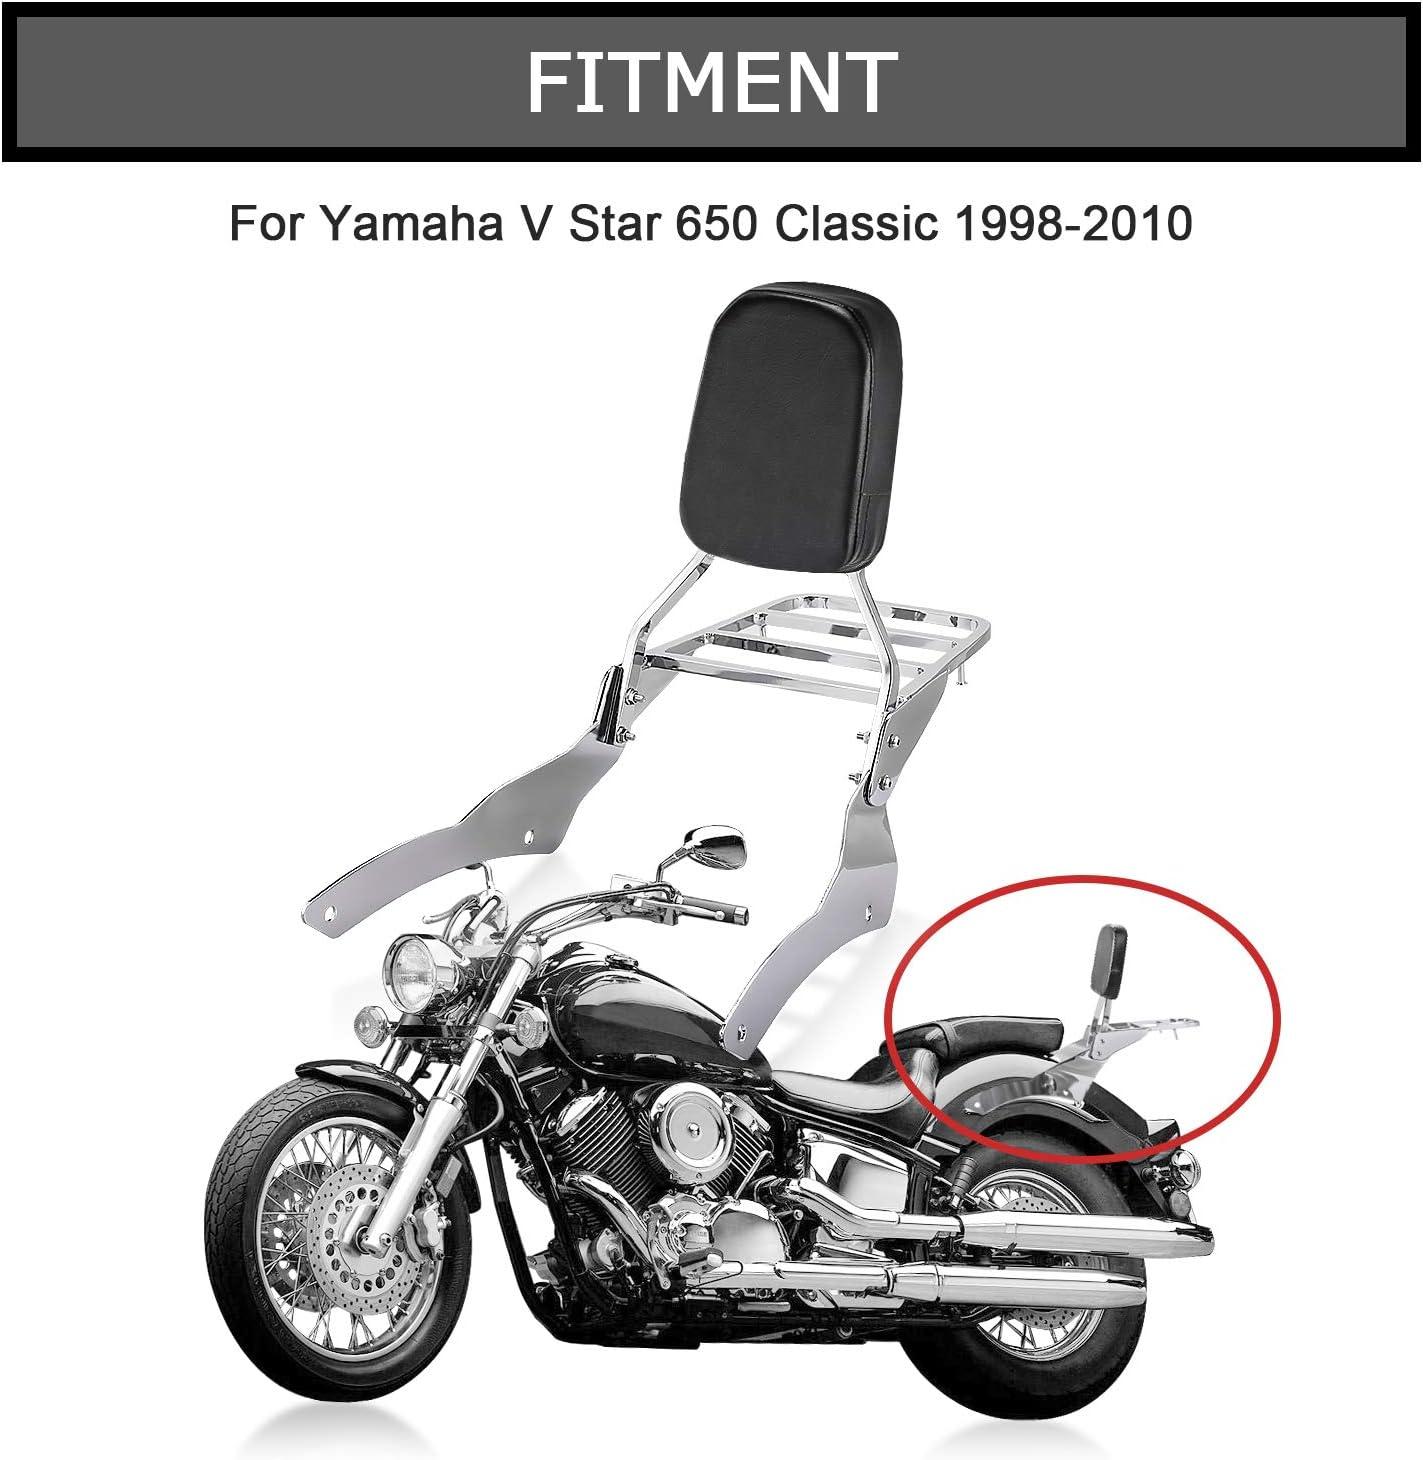 MotorFansClub Passenger Back Seat Cushion Backrest Sissy Bar Luggage Rear Rack Fit For Compatible With Yamaha V Star 650 400 Custom 96-2011 For Yamaha Drag Star 400 650 Custom 1997-2011 Black